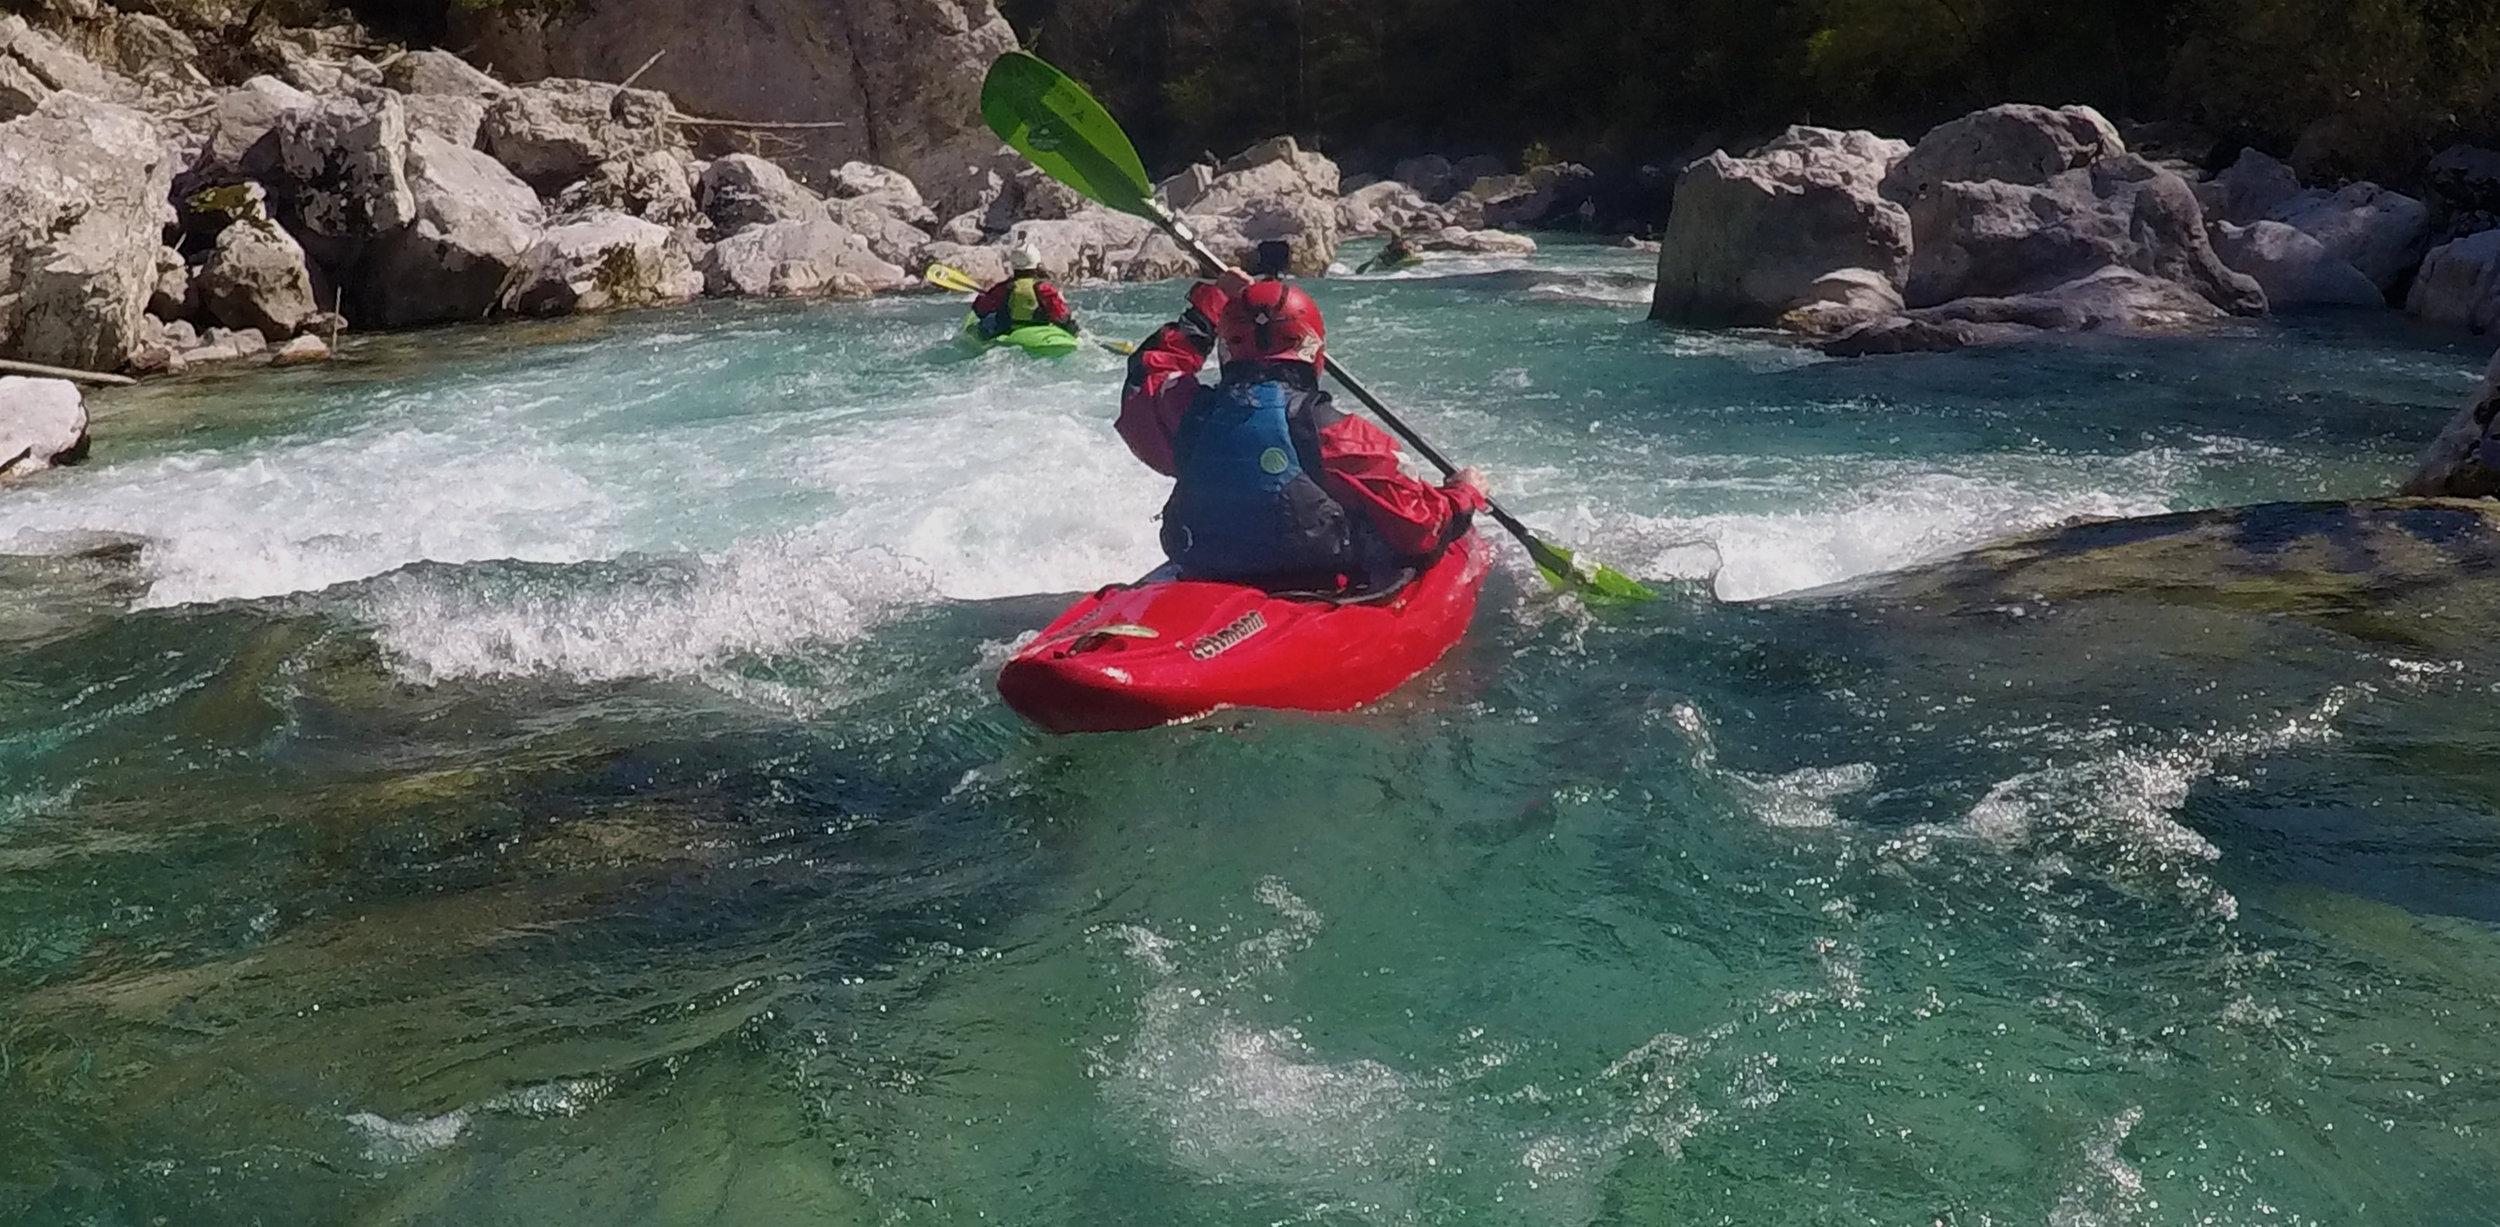 Kayaking-Courses-Soca-Valley-Slovenia.jpg